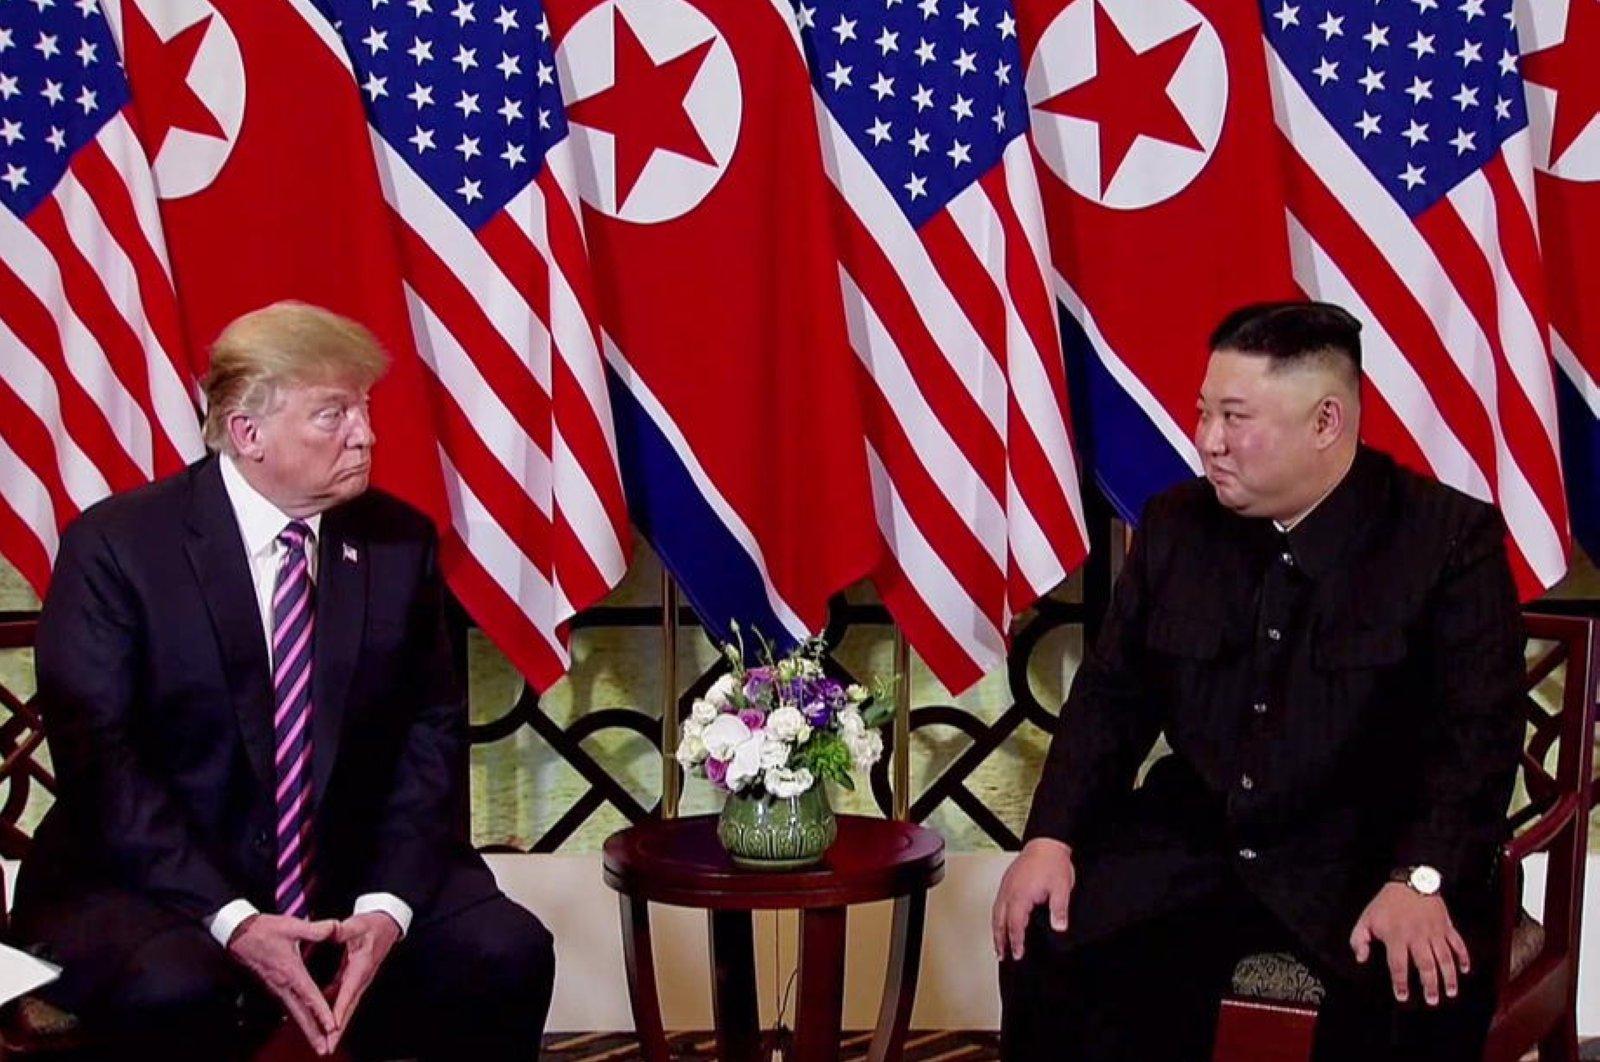 North Korean leader Kim Jong Un (R) and U.S. President Donald Trump (L) exchange glances during the second U.S.-North Korea summit, Hanoi, Feb. 27 2019. (EPA Photo)